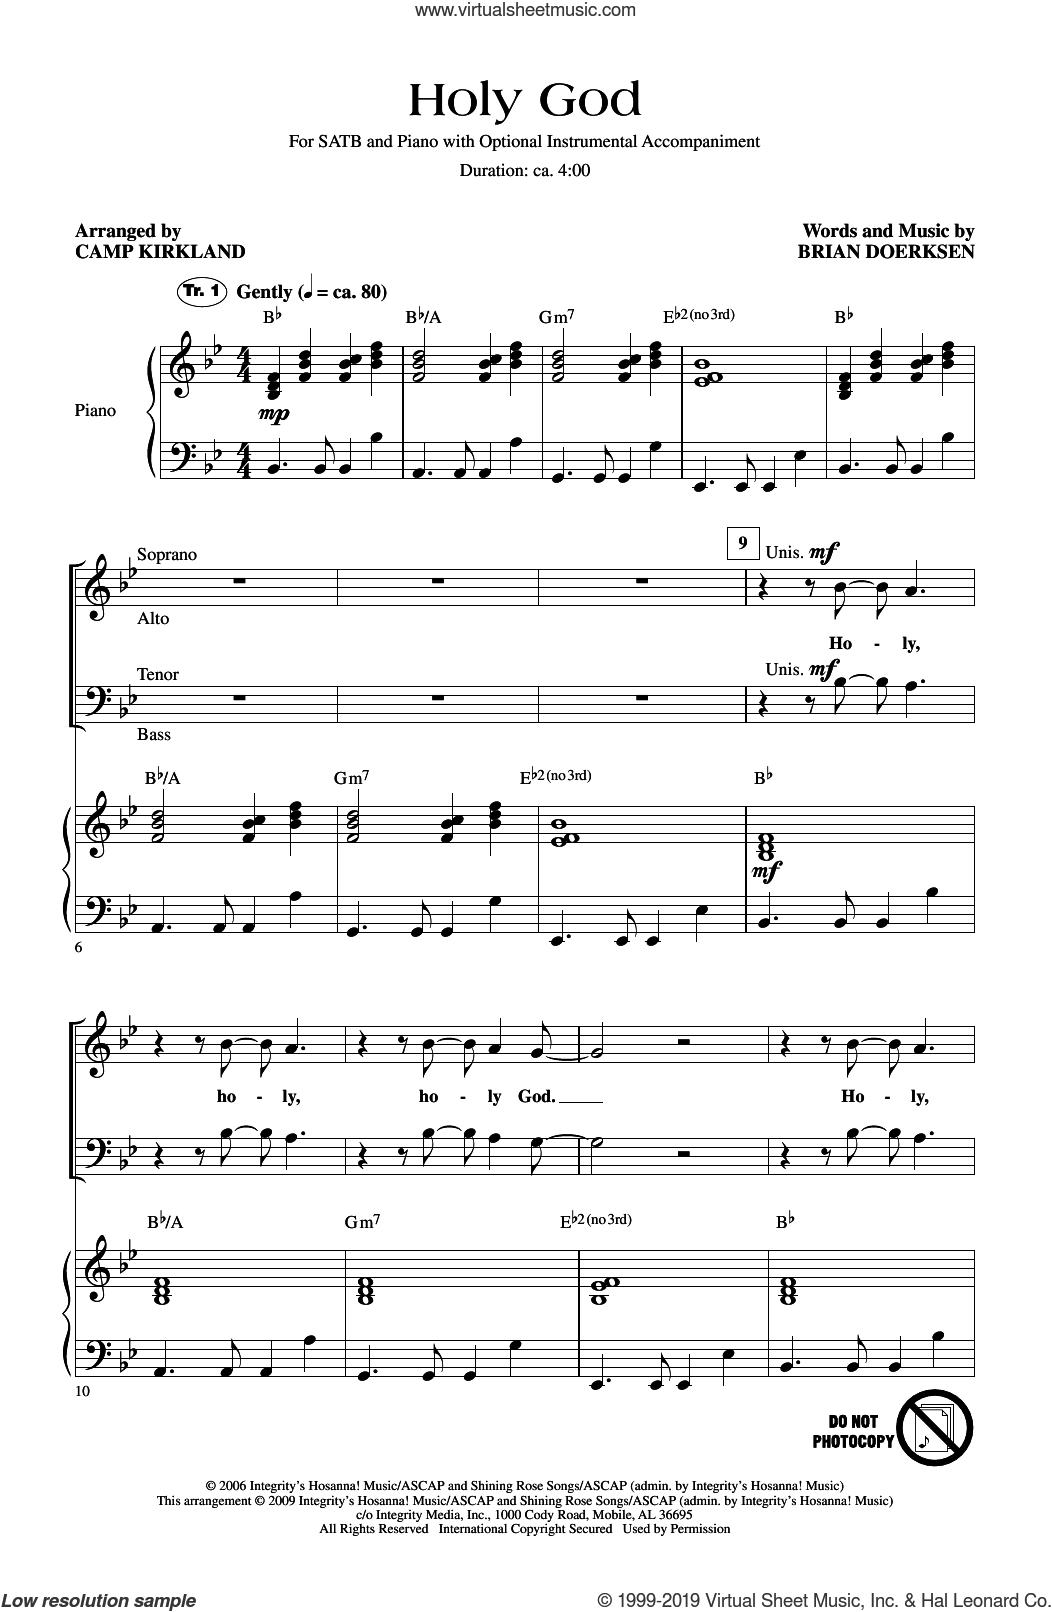 Holy God (arr. Camp Kirkland) sheet music for choir (SATB: soprano, alto, tenor, bass) by Brian Doerksen and Camp Kirkland, intermediate skill level